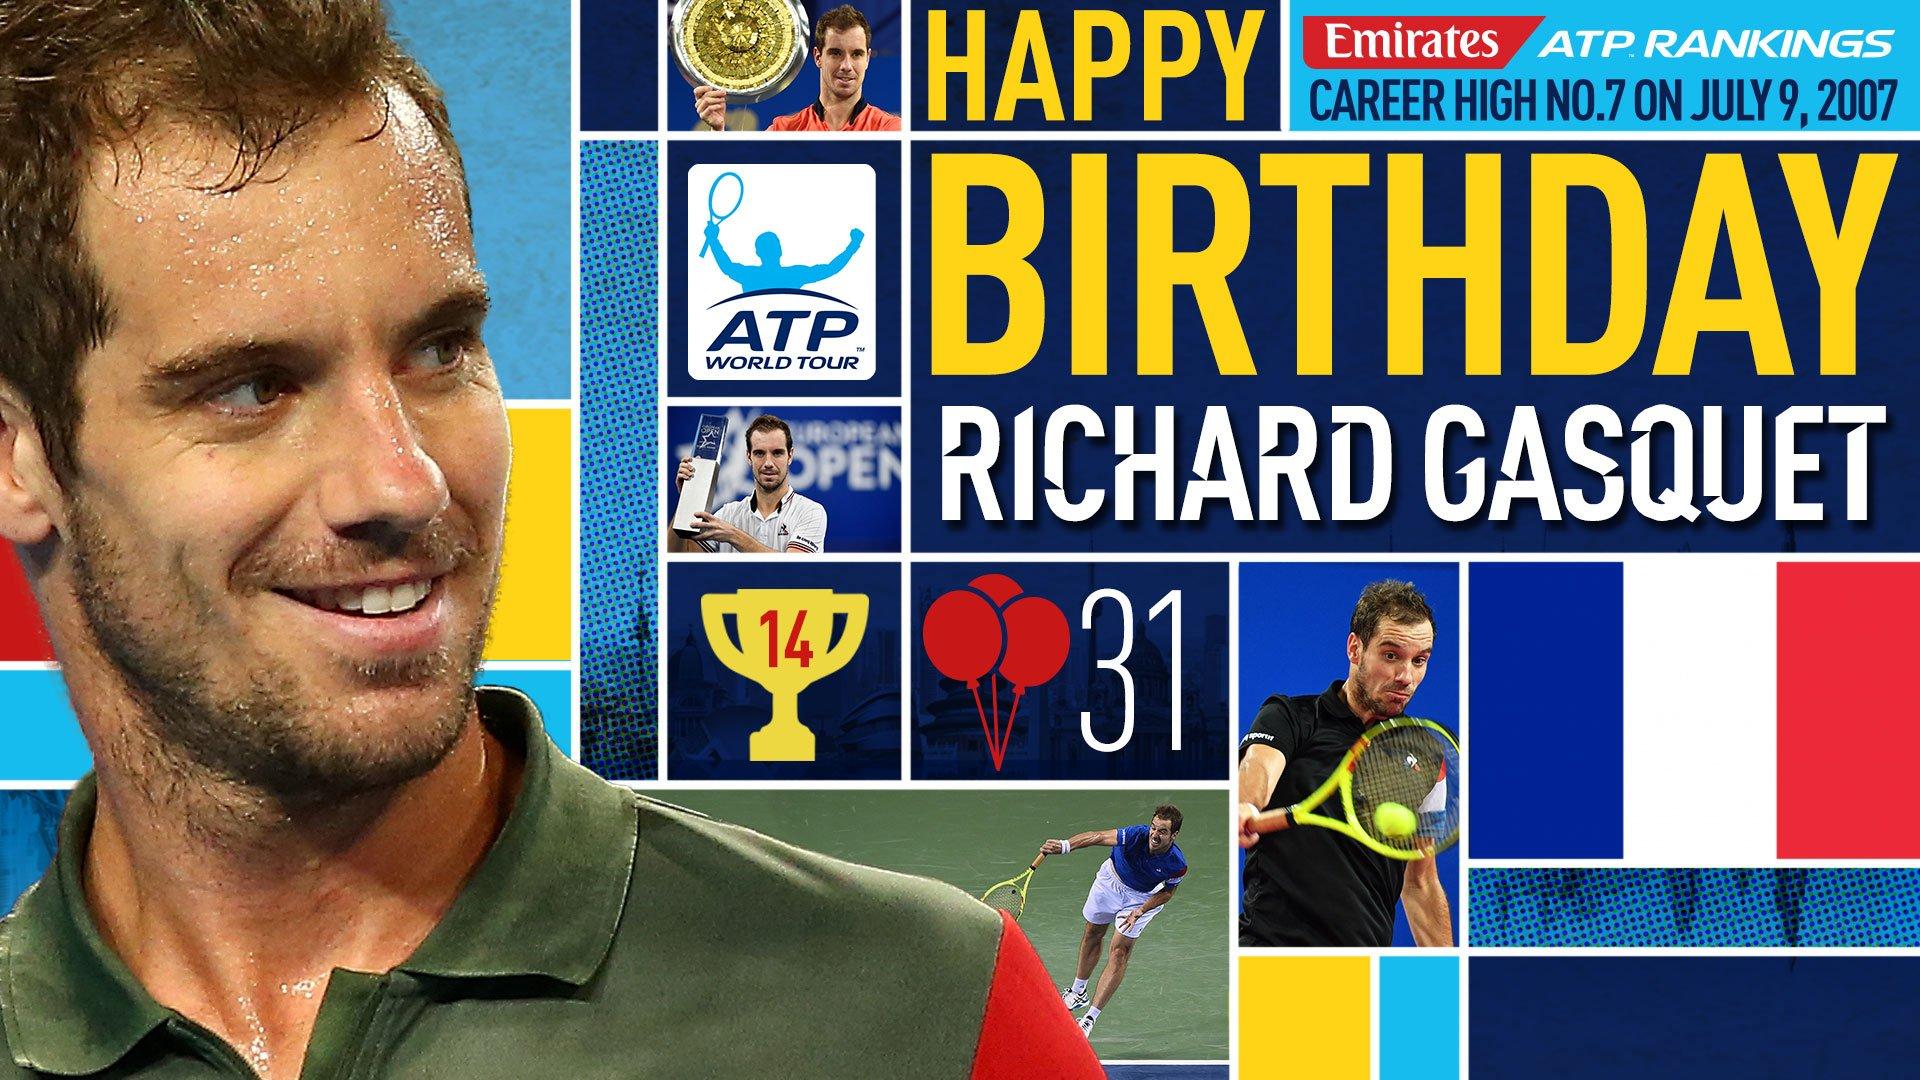 Happy 31st birthday @richardgasquet1! Bon anniversaire! ������ View #ATP Profile: https://t.co/xOJaz99dmX https://t.co/Km1ssvJKyy